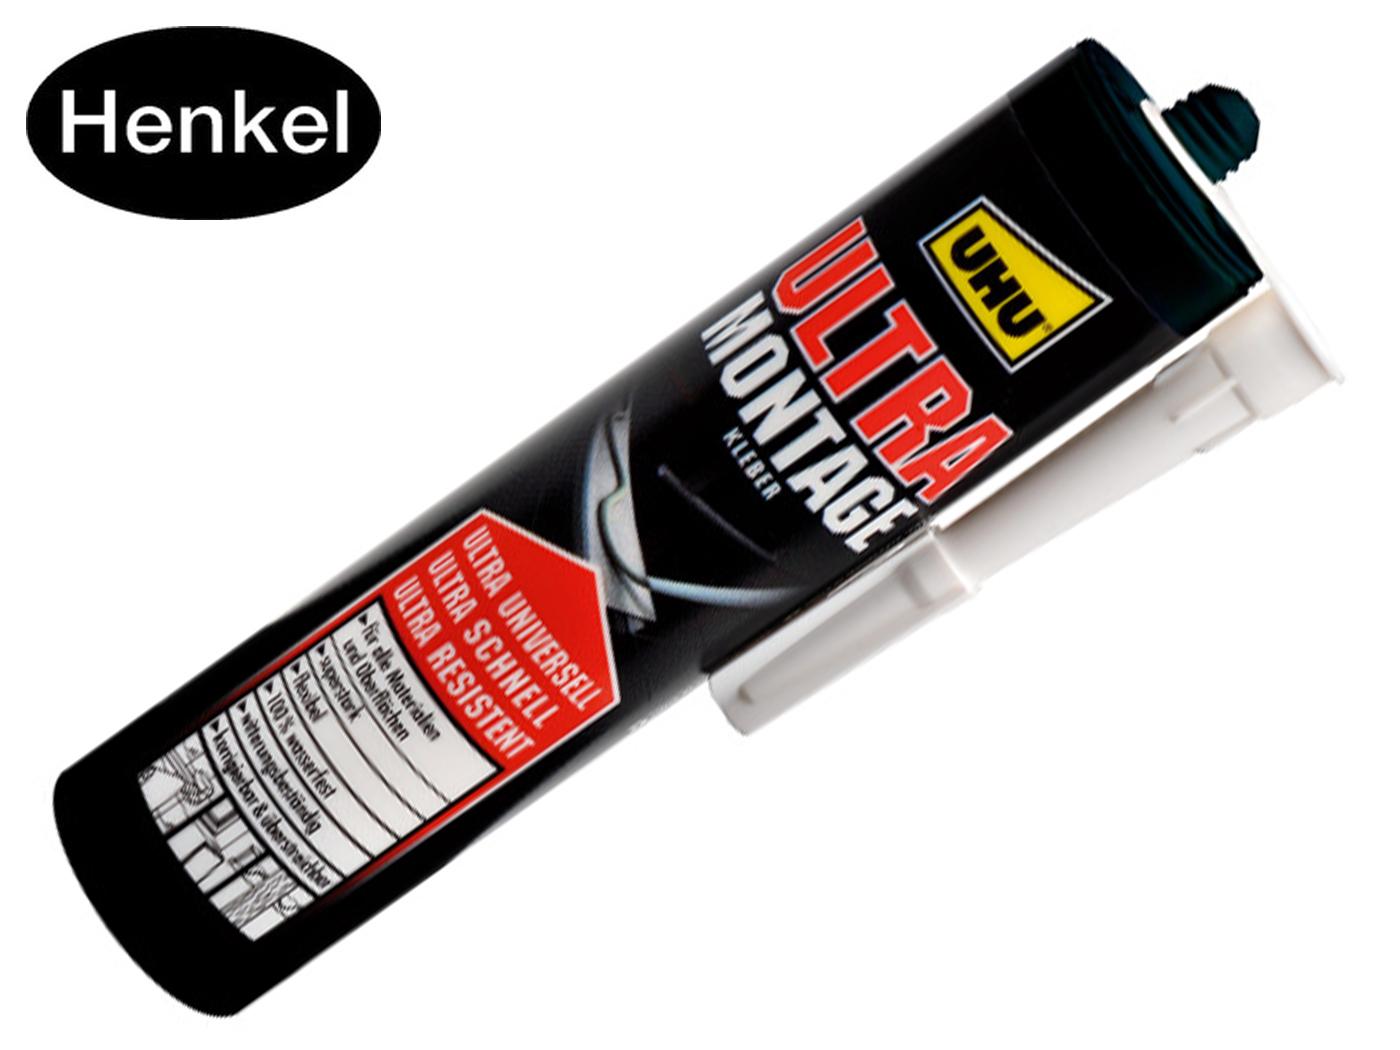 UHU ULTRA MONTAGE kit | DKMTools - DKM Tools